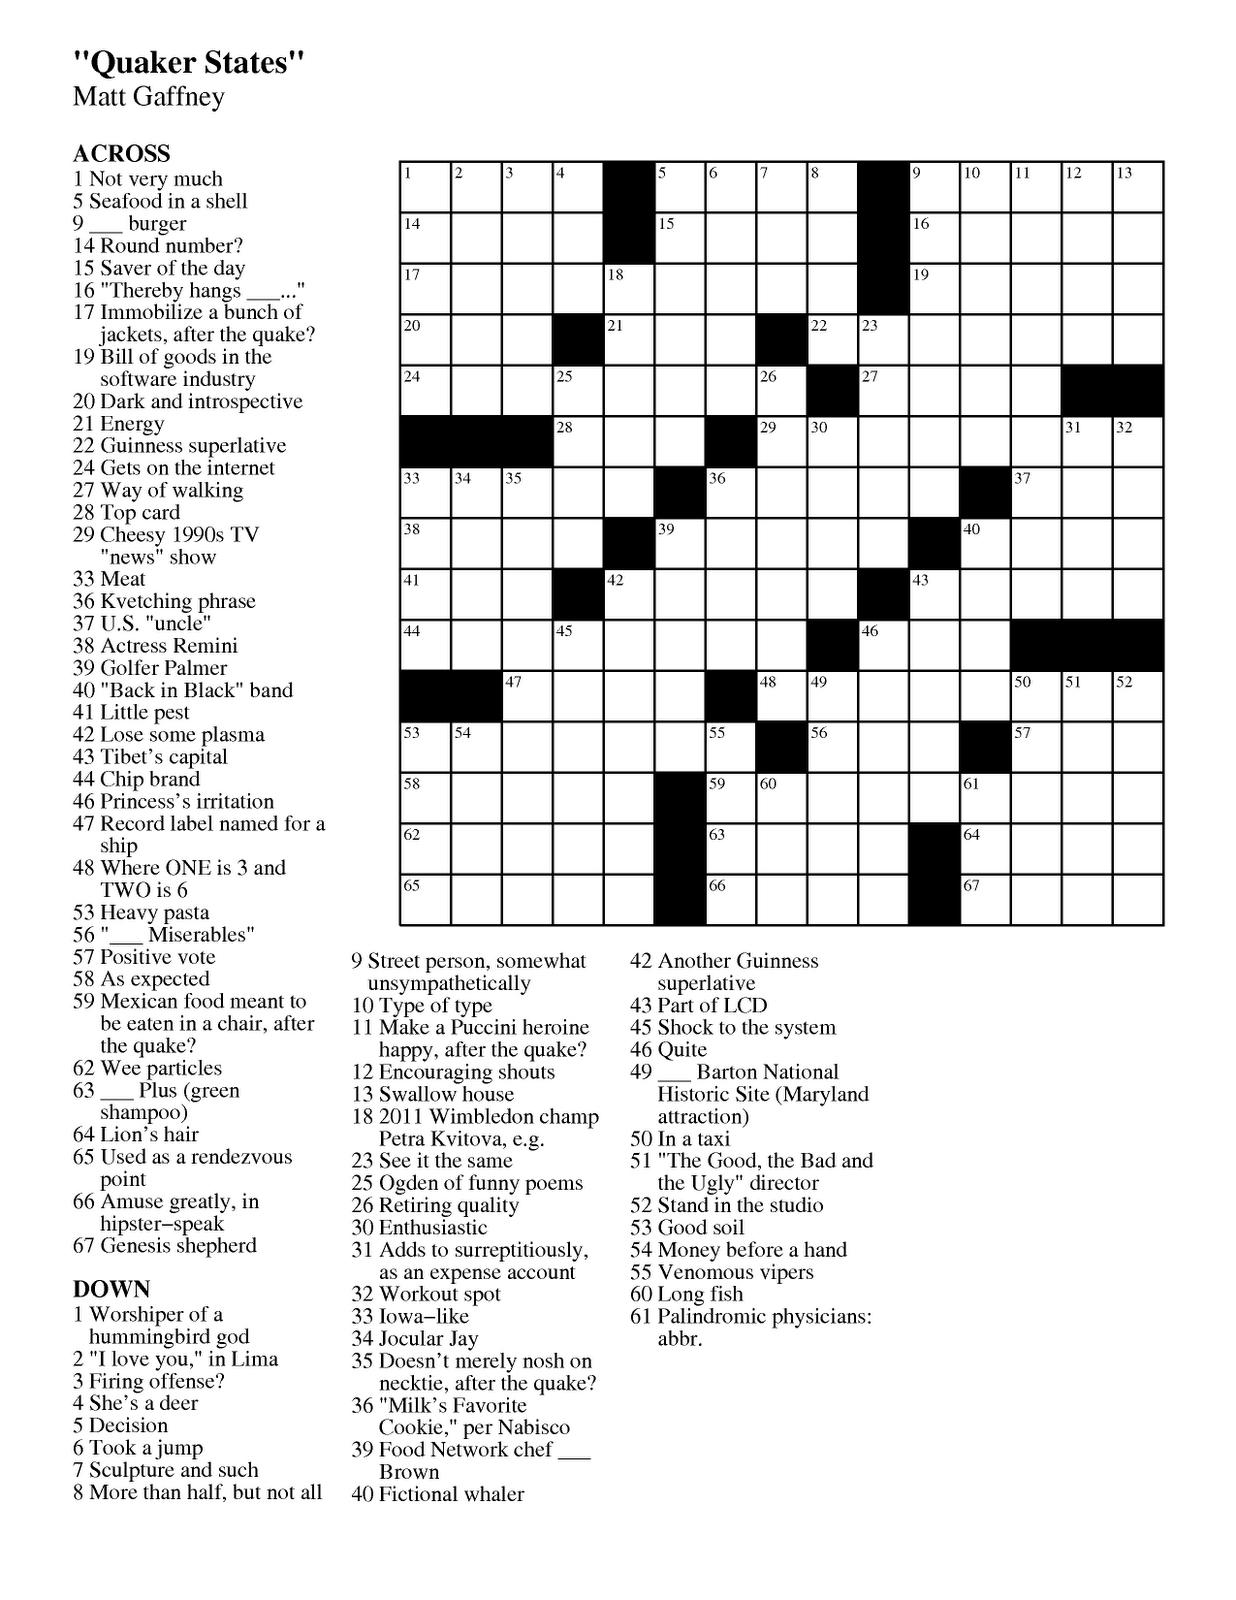 Summer Crossword Puzzle Worksheet - Free Esl Printable Worksheets - Printable Crossword Puzzles For High School Students